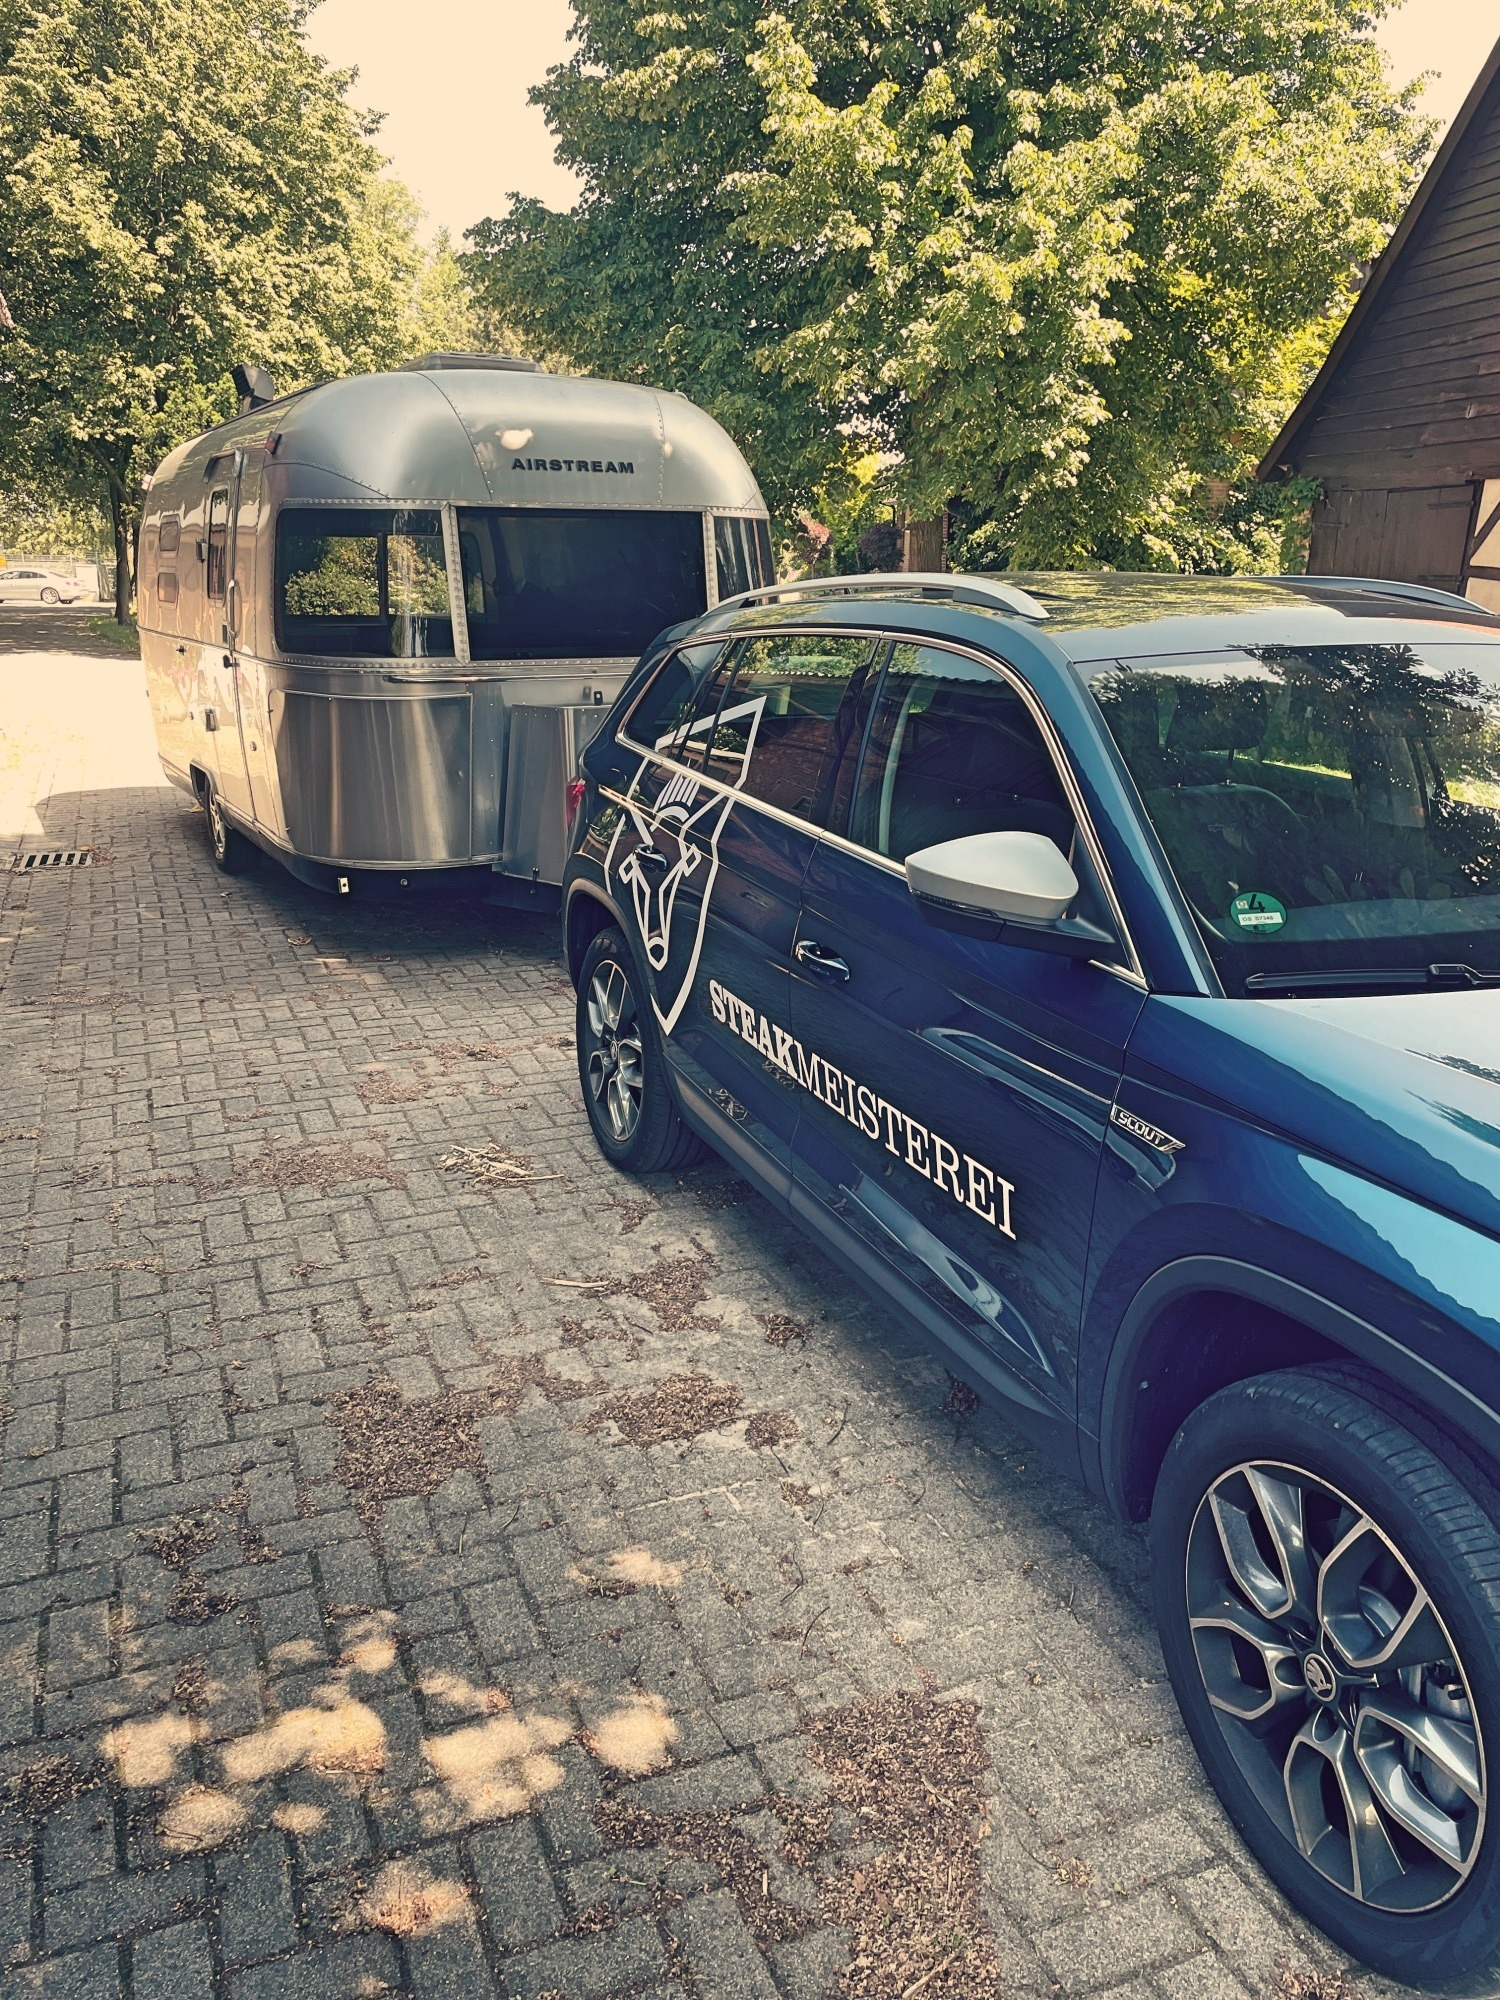 Steakmeisterei Osnabrück Foodtrailer Foodtruck Airstream